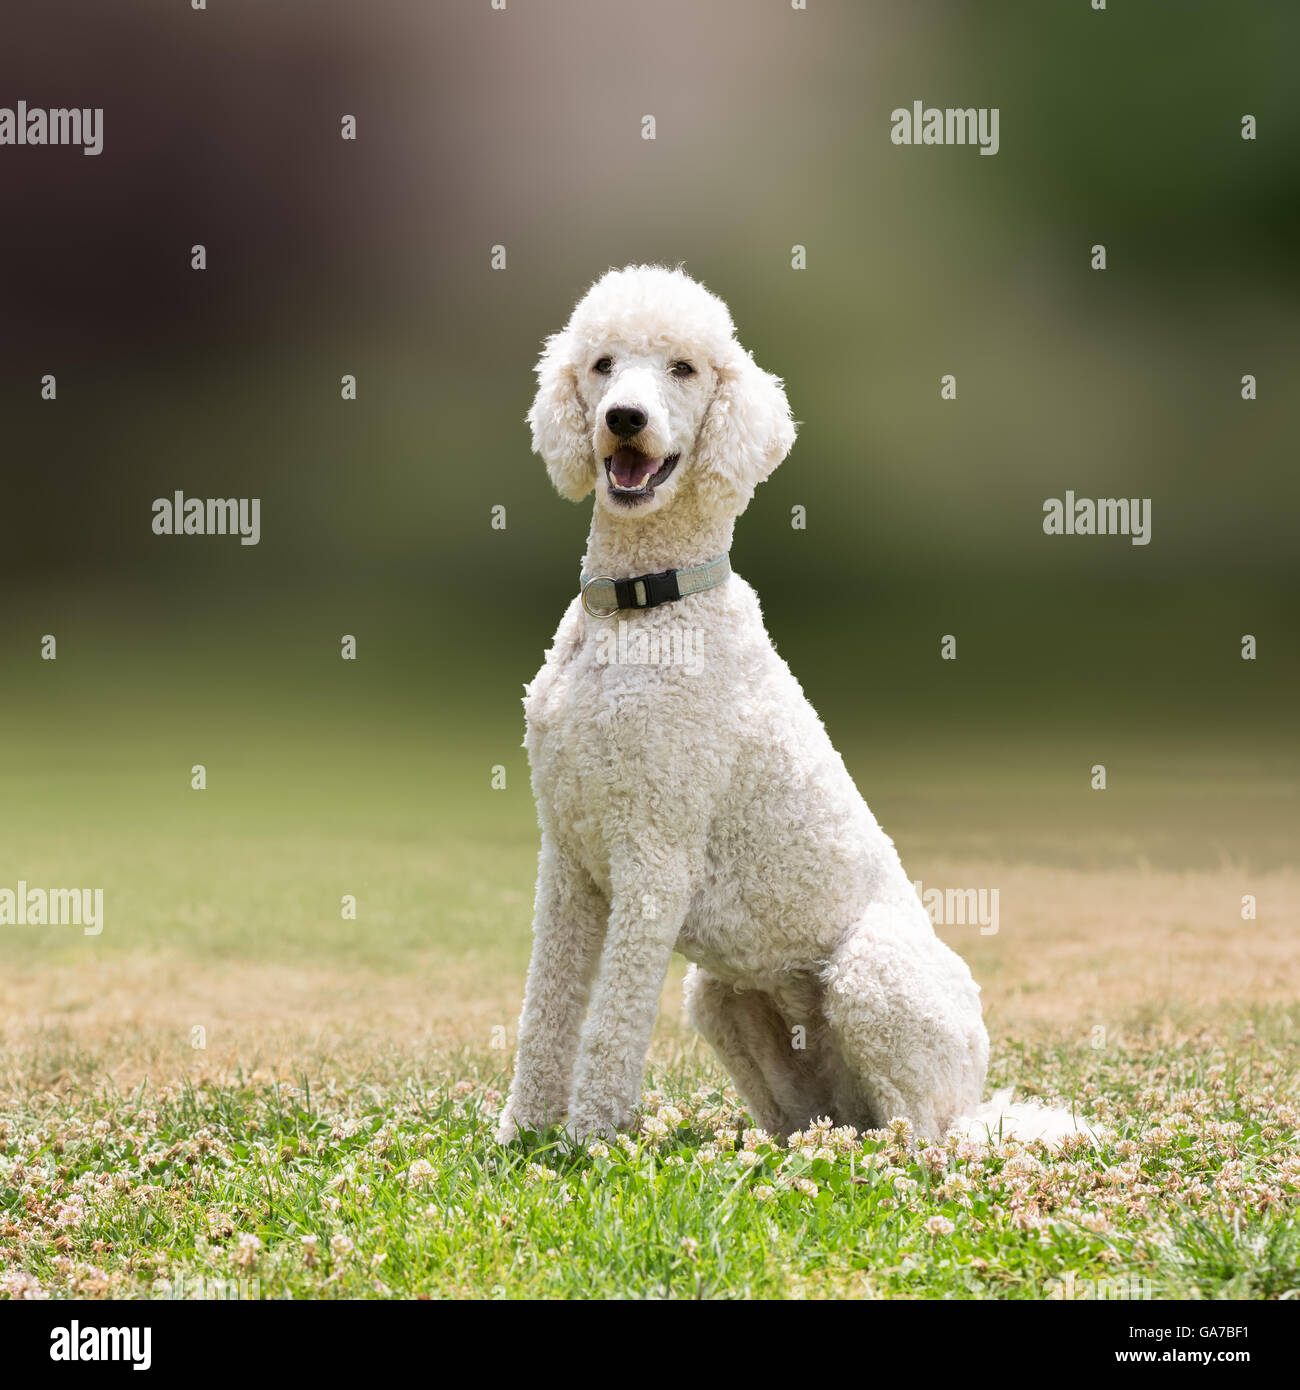 Perro caniche blanca vertical. Foto de stock